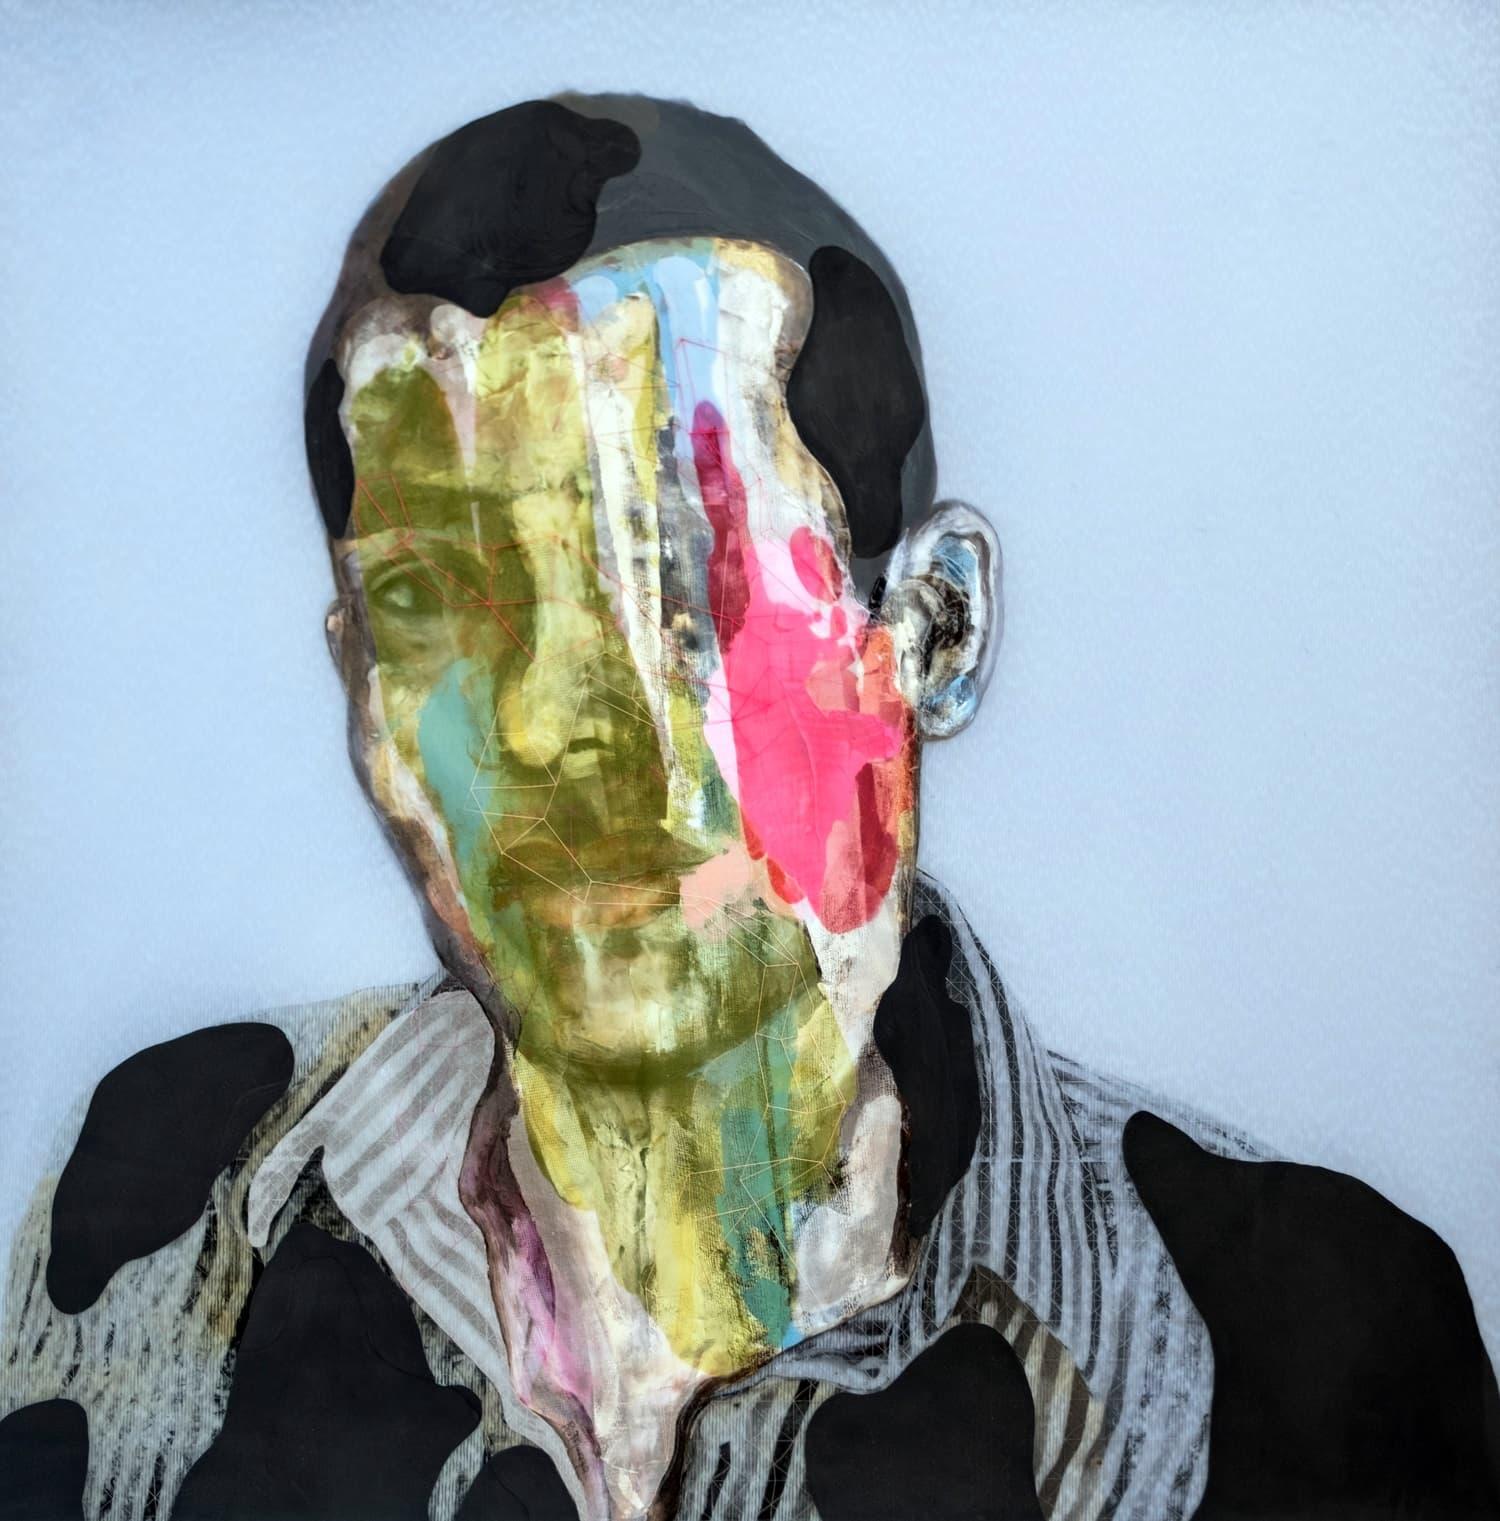 Rogelio Manzo Lucio, 102 x 102 cm Oil and mixed on resin panel, Oel und Mixed Media auf Epoxidharz Platte: 2020